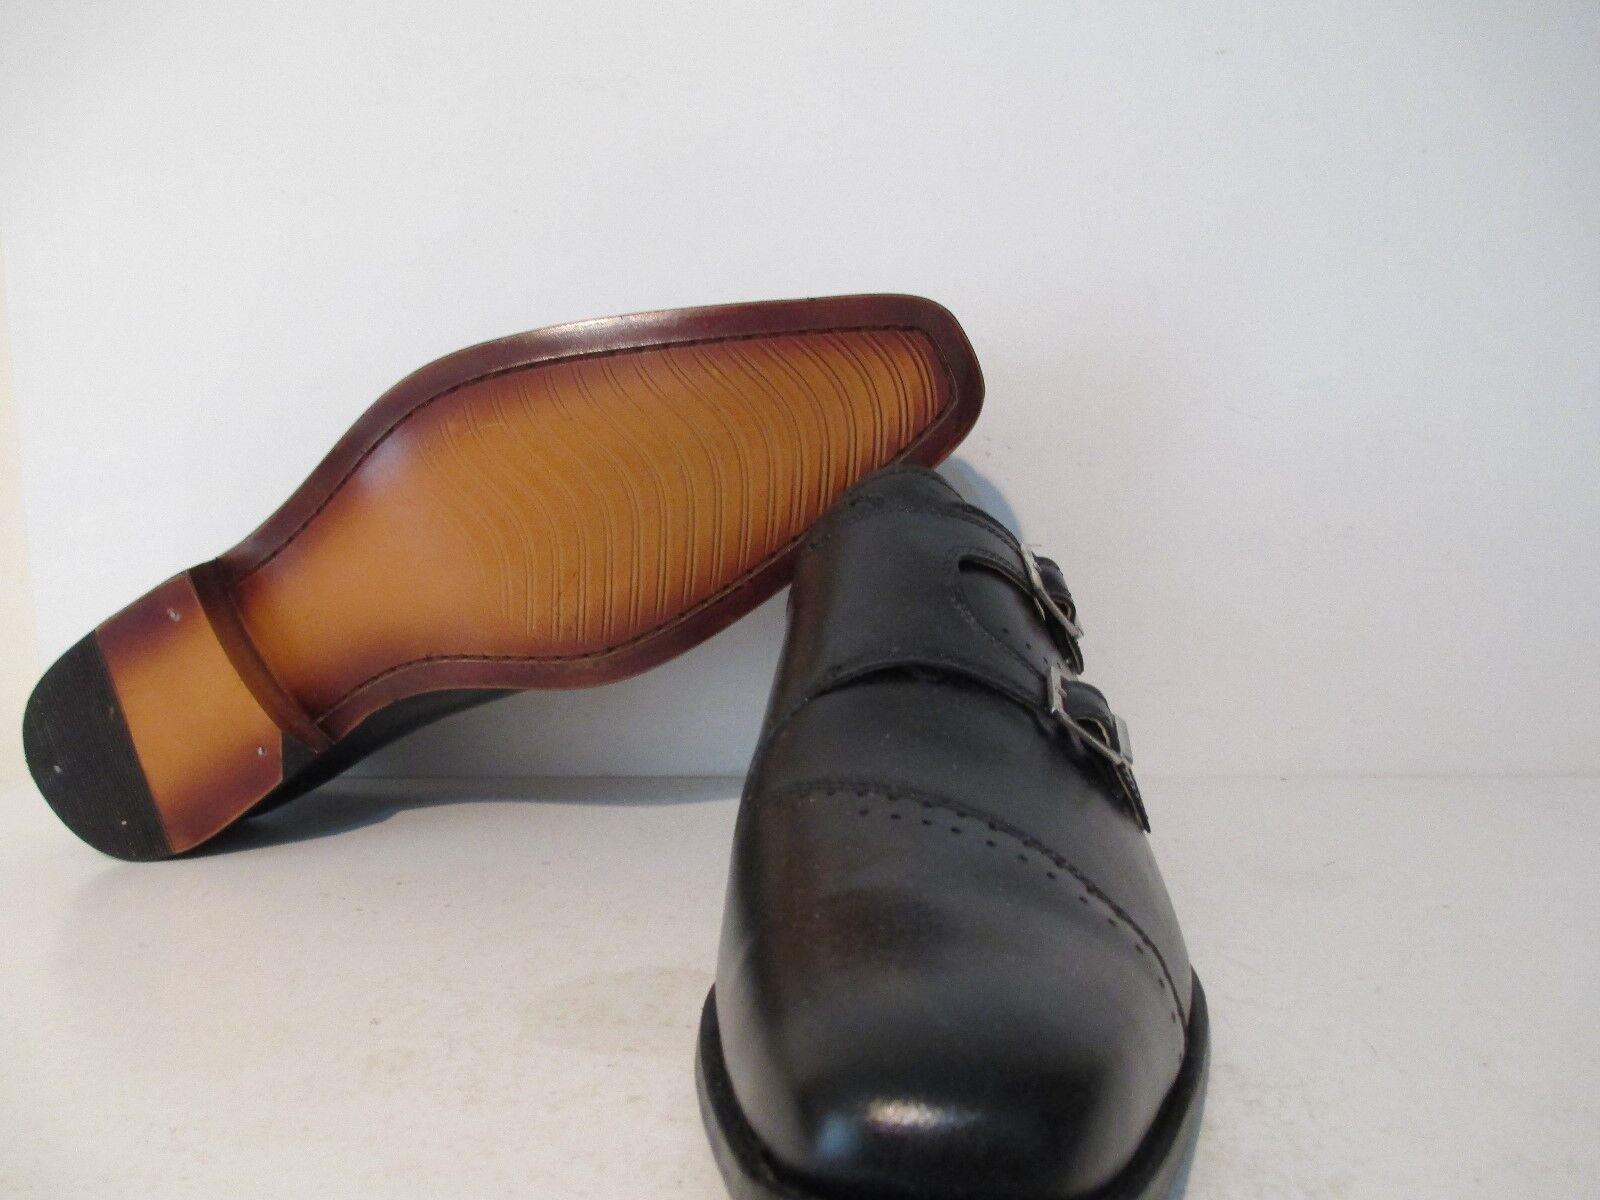 e37a021c842 ... Zapatos De Vestir Giorgio Brutini para para para hombre de cuero  Carbonne Doble Monje Sin Cordones